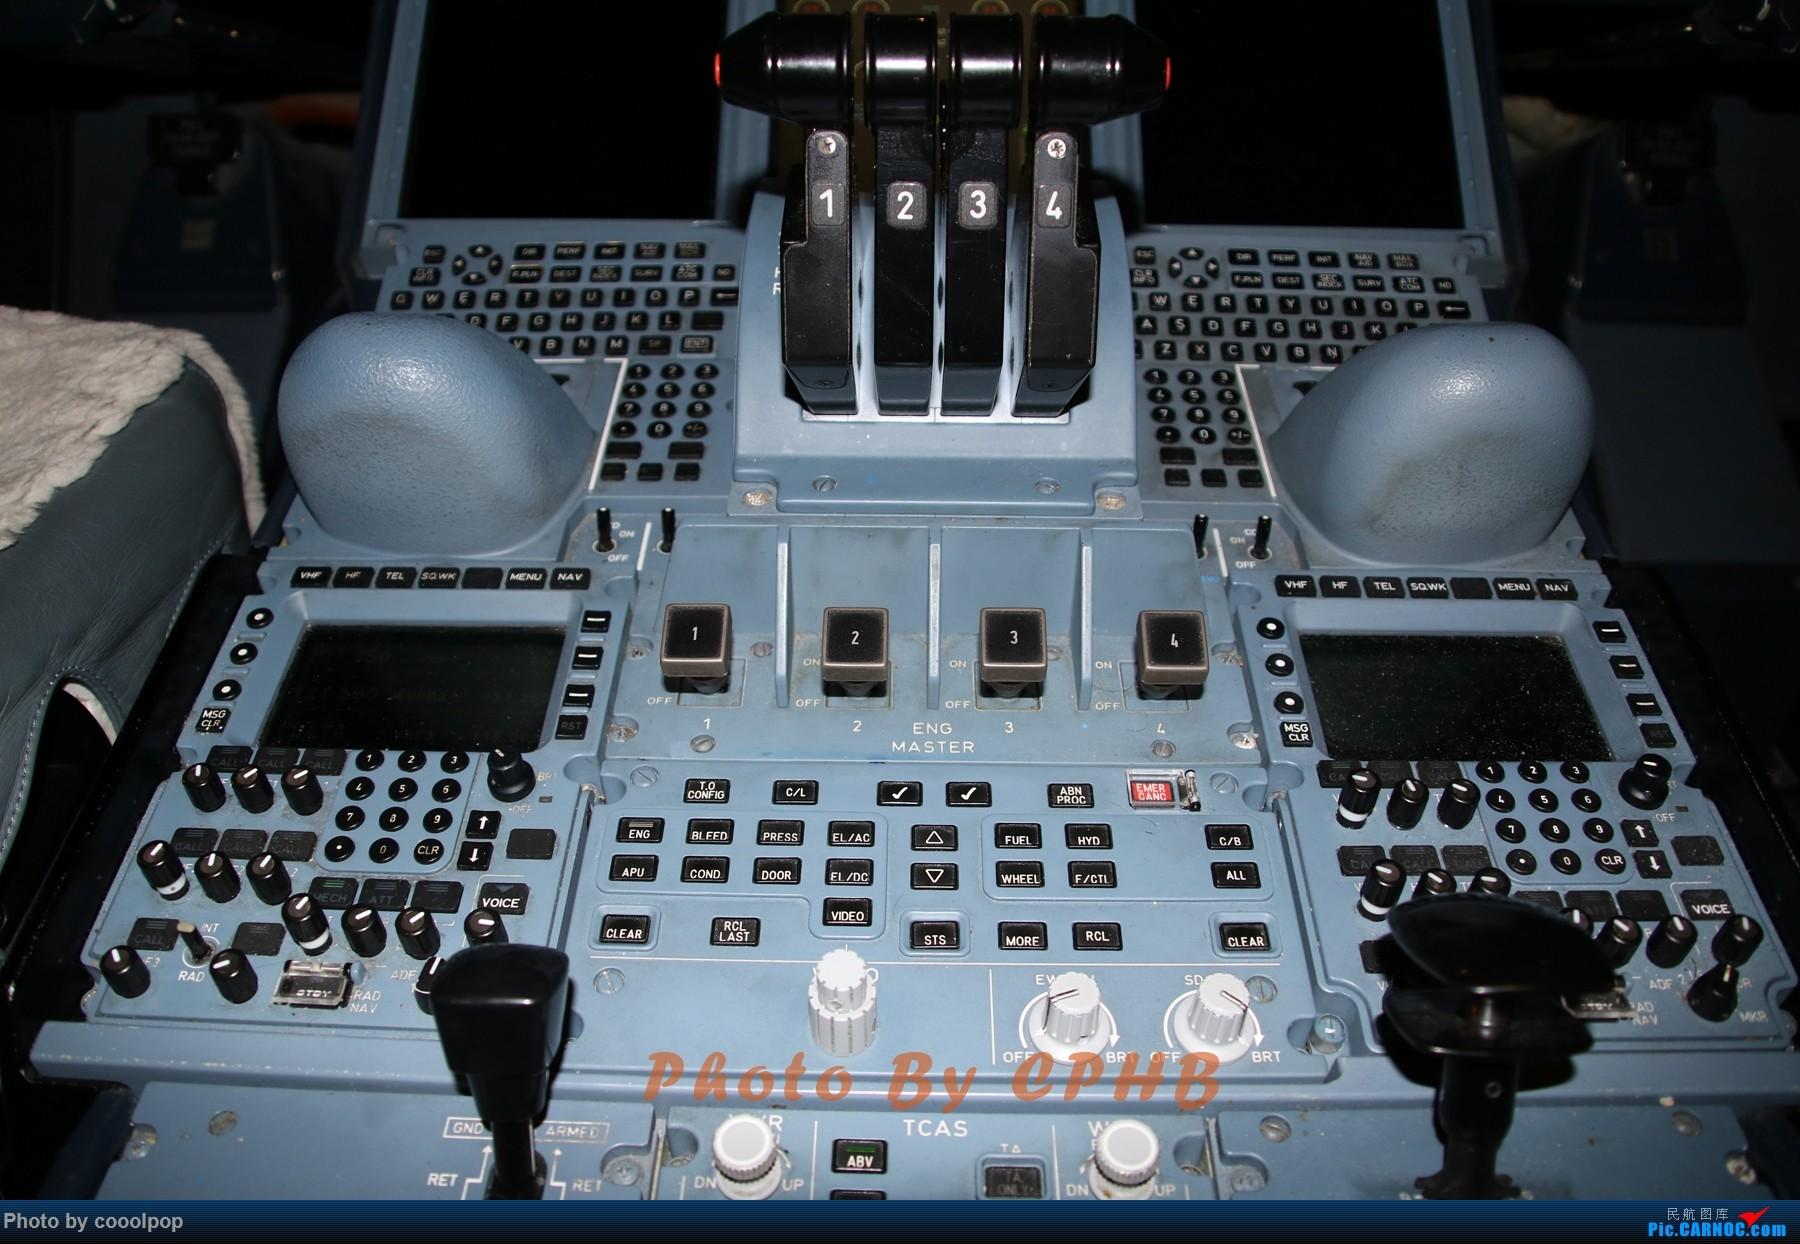 Re:好些年没来了!发了去年的游记帖子吧 PEK-CDG-VCE-DXB-PEK。法航 阿联酋航空混飞 A380驾驶舱 商务舱 头等舱 外场 A380-800 A6-EEC 中国北京首都国际机场